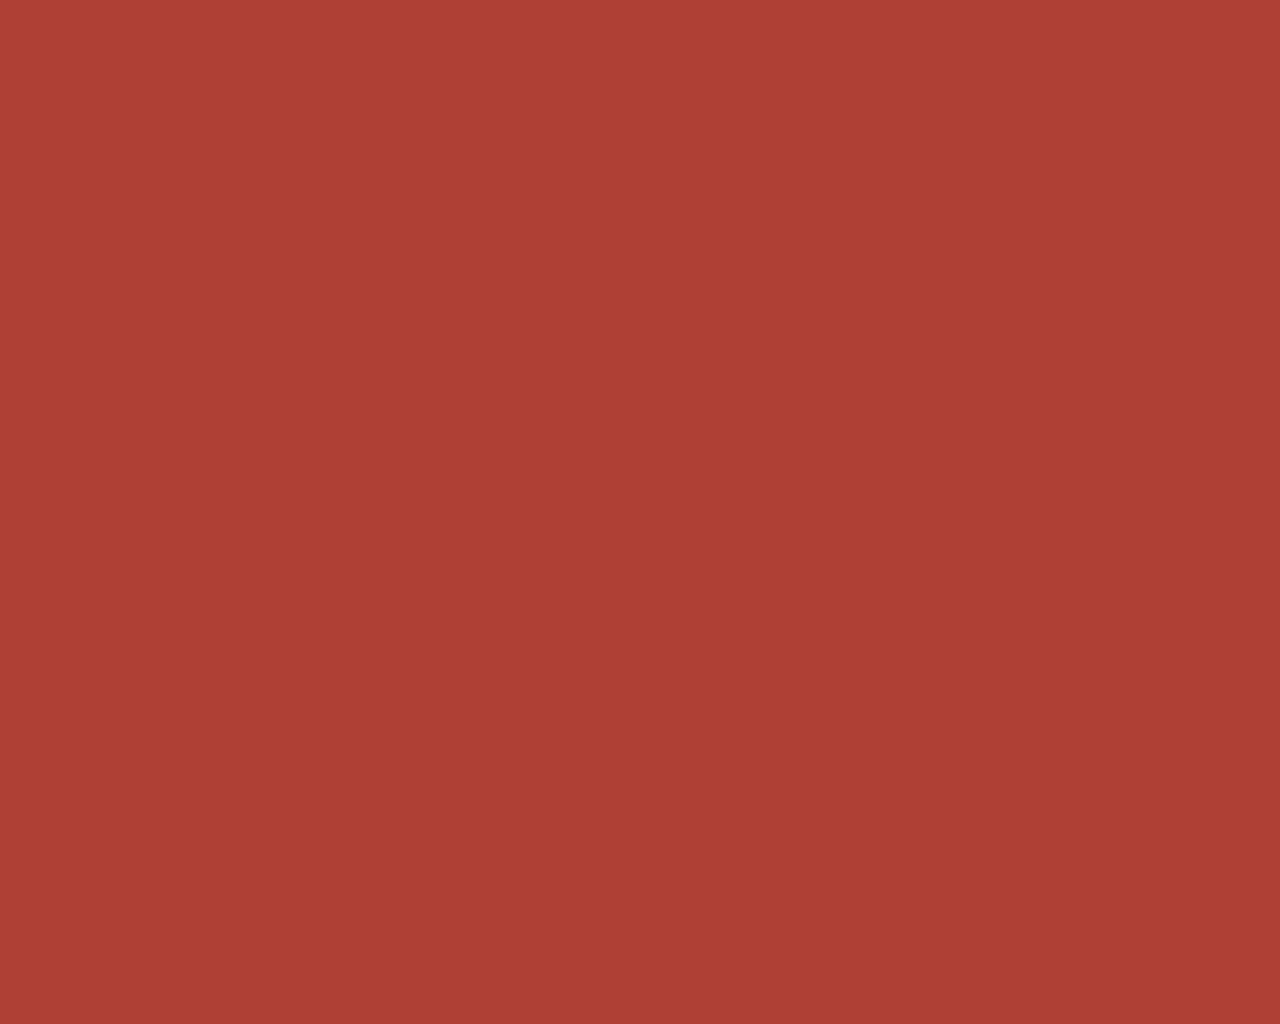 1280x1024 pale carmine solid color background